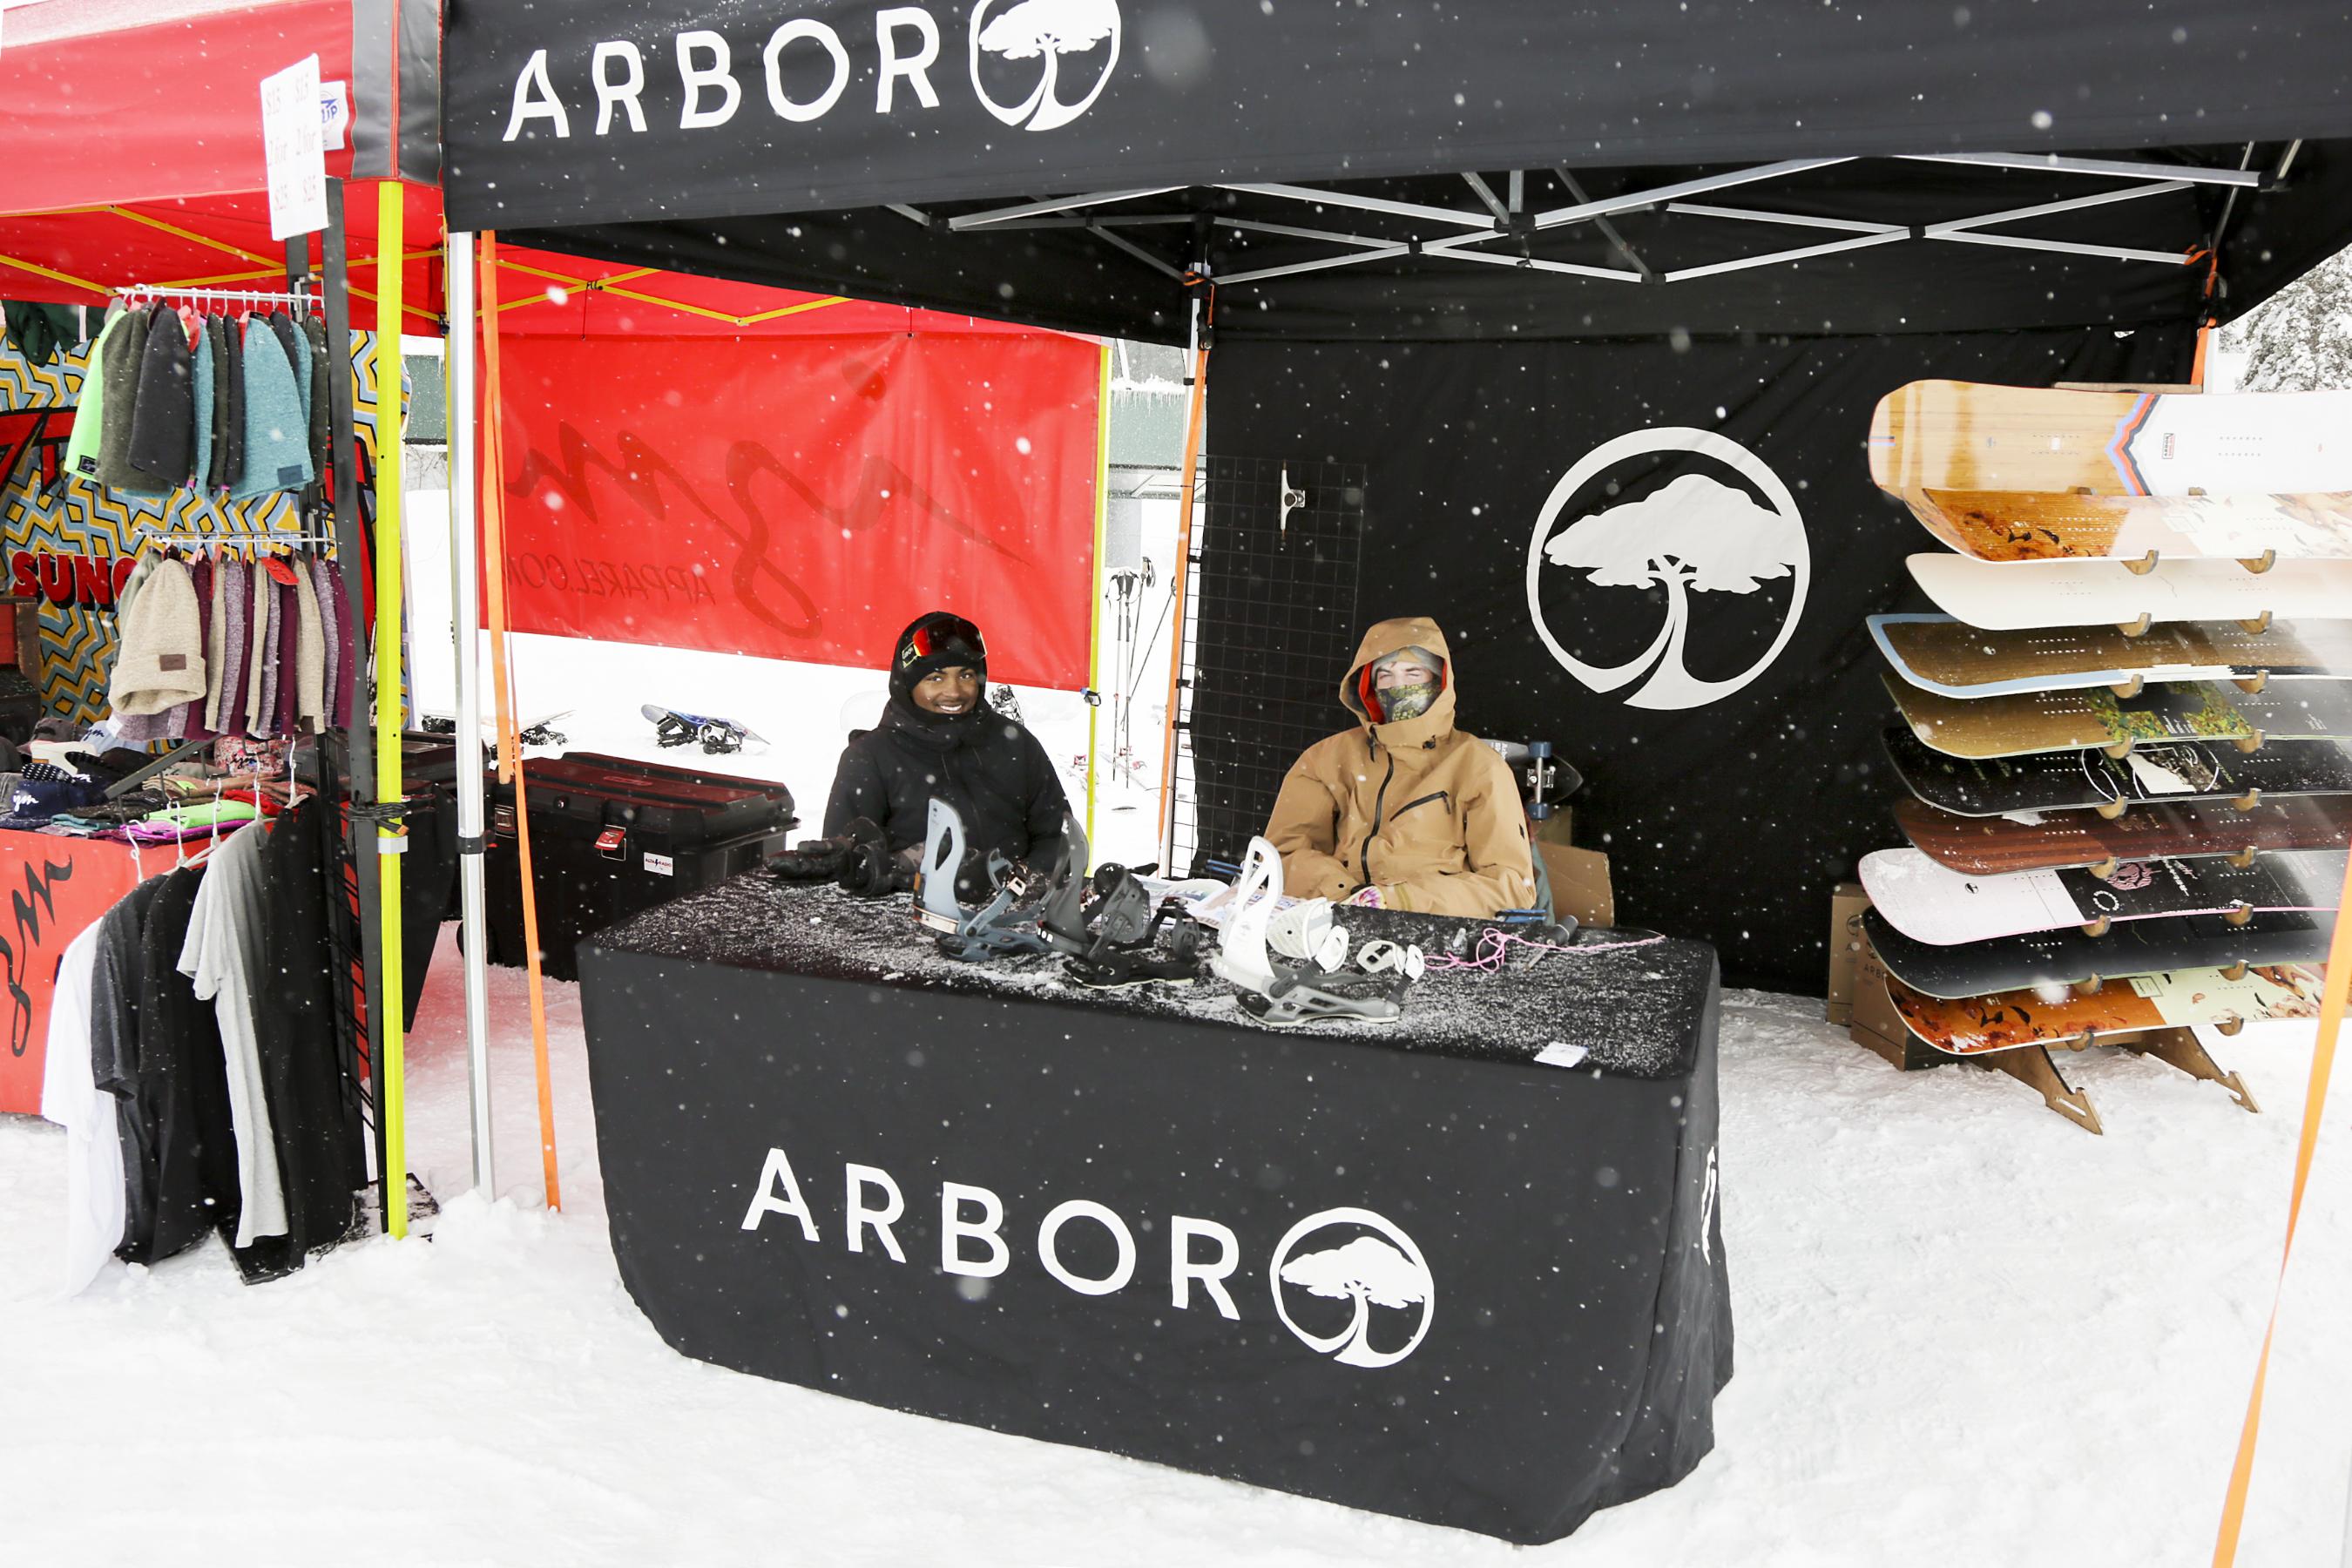 Jack Hessler and Jack Griffin of Arbor Snowboards staying warm.